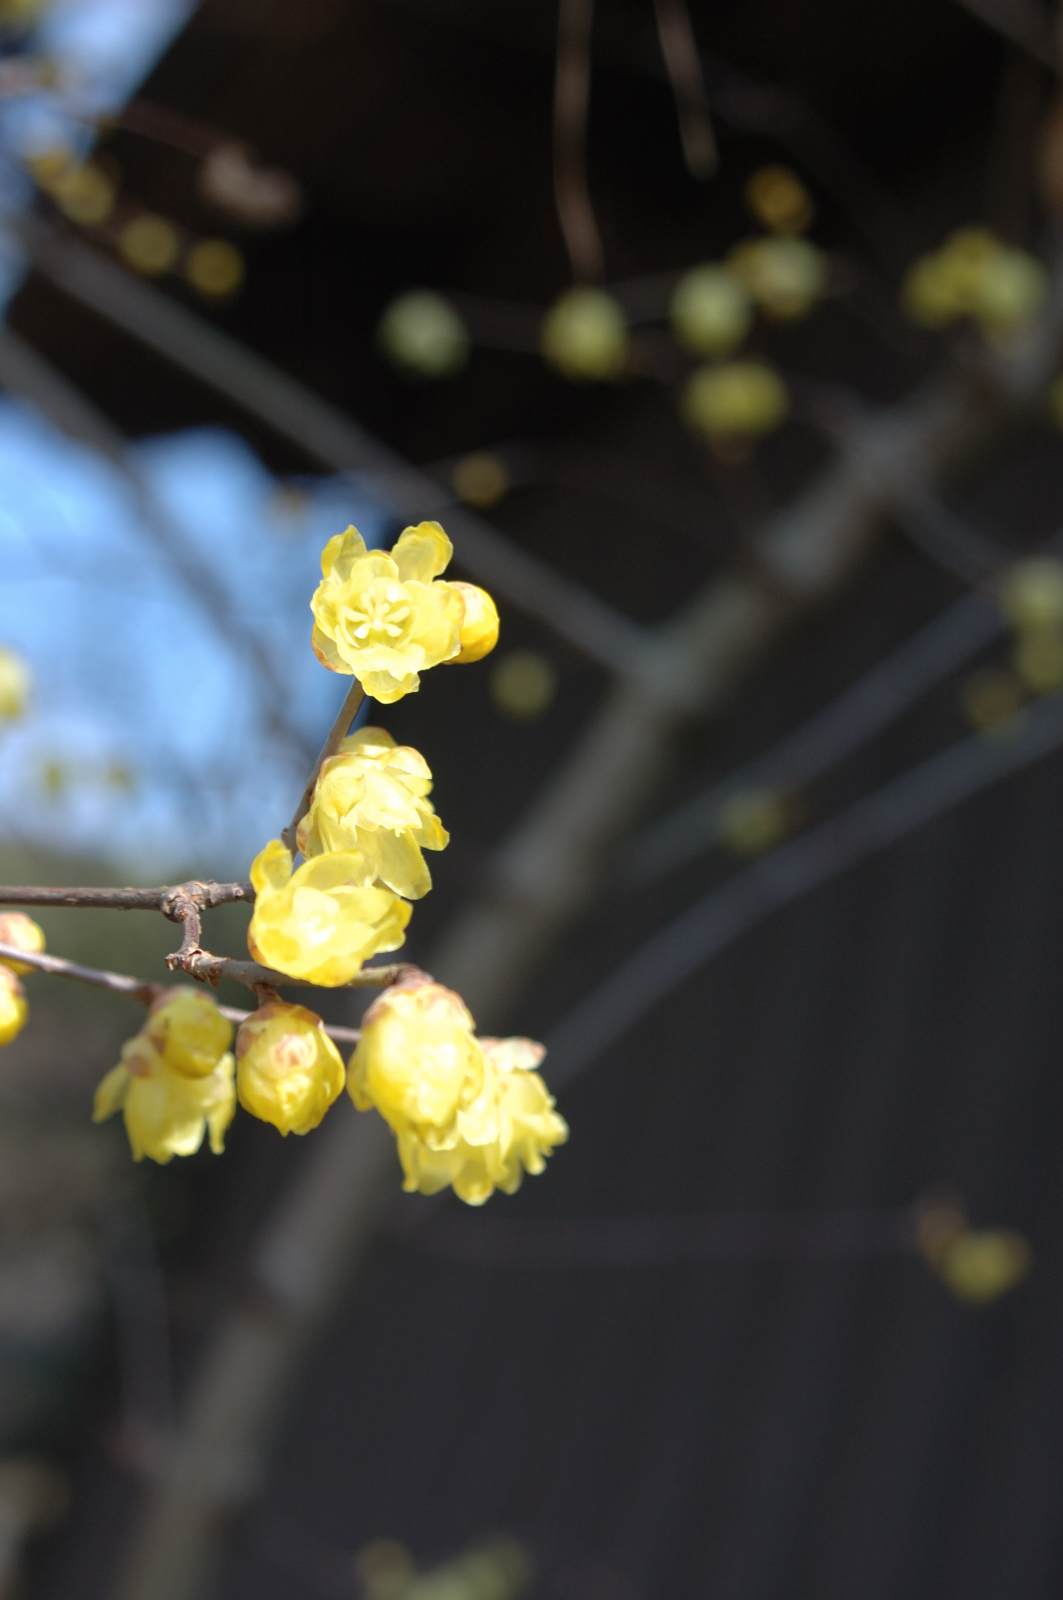 Image of Japanese allspice